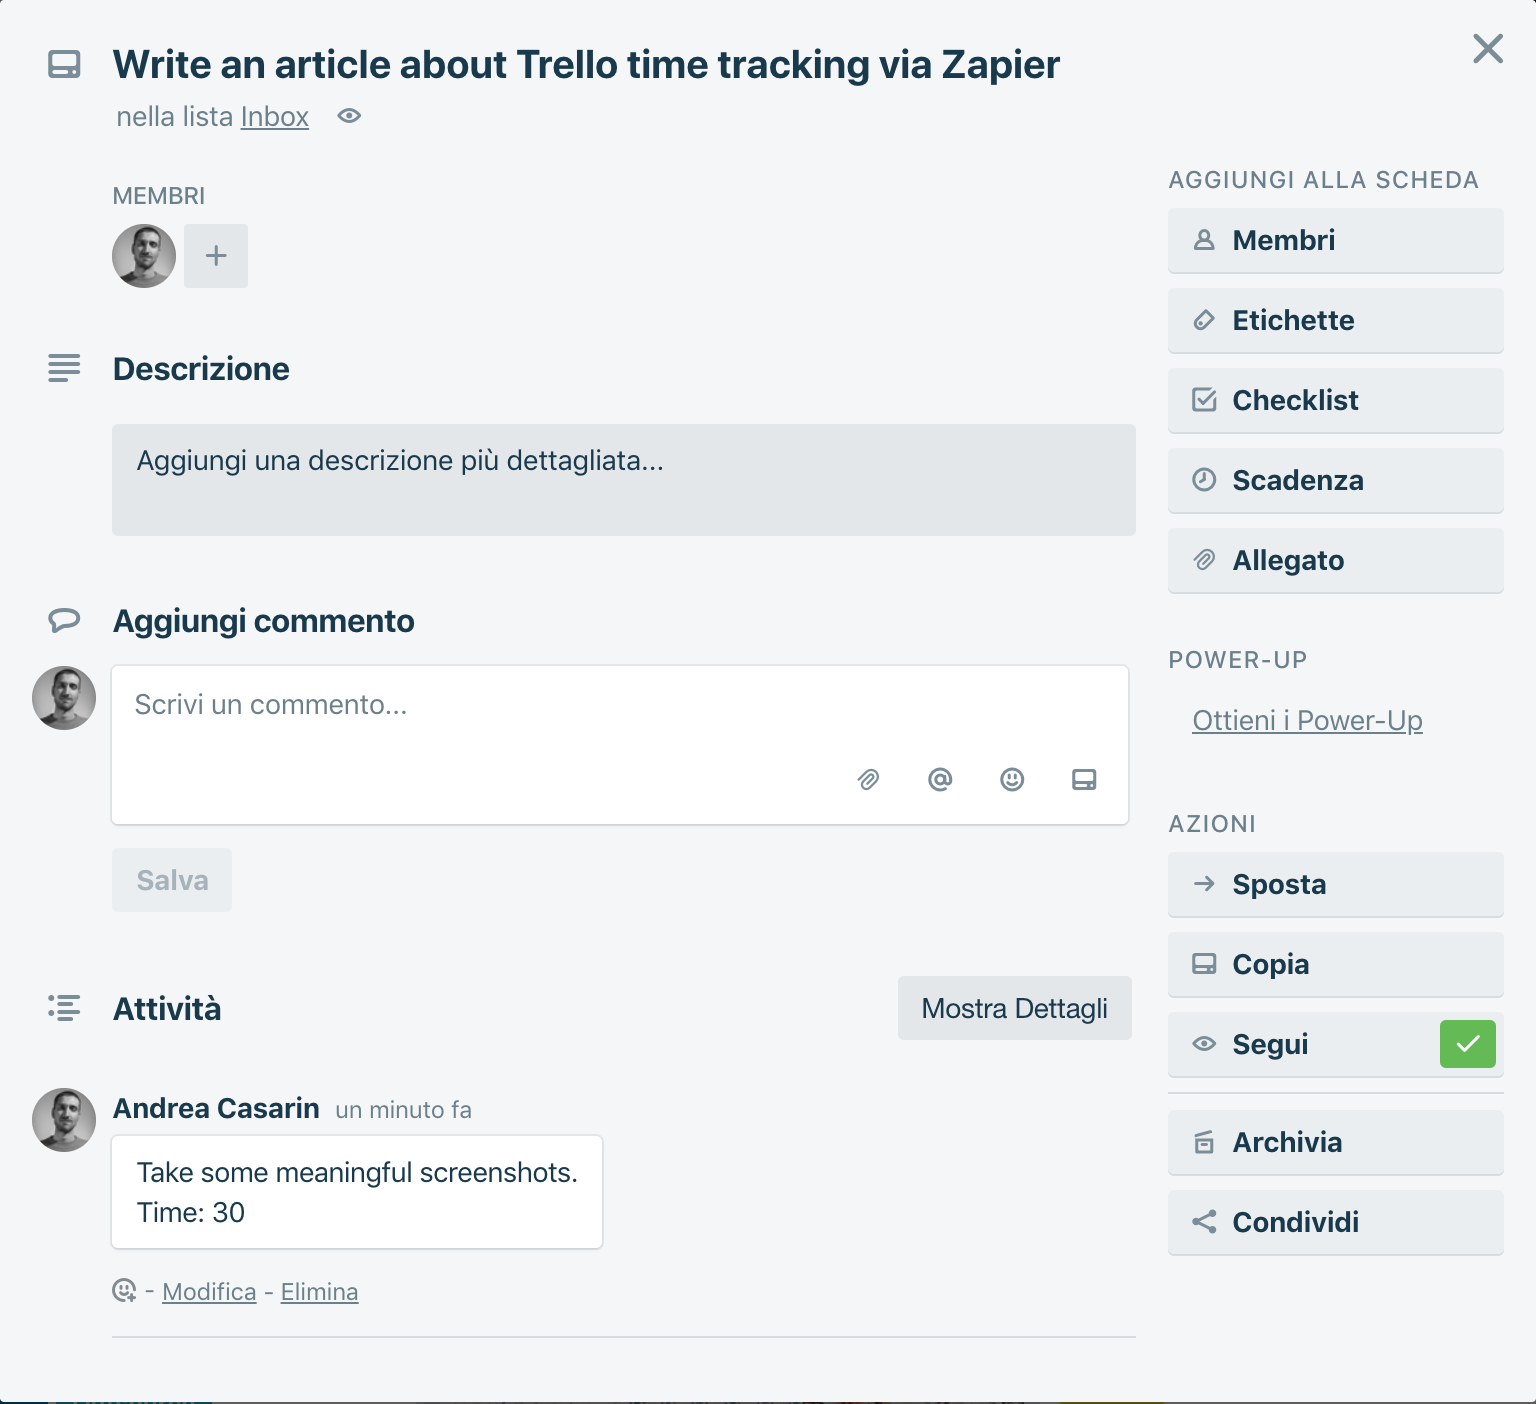 Trello + Zapier + Google Sheets = Time Tracking - Step